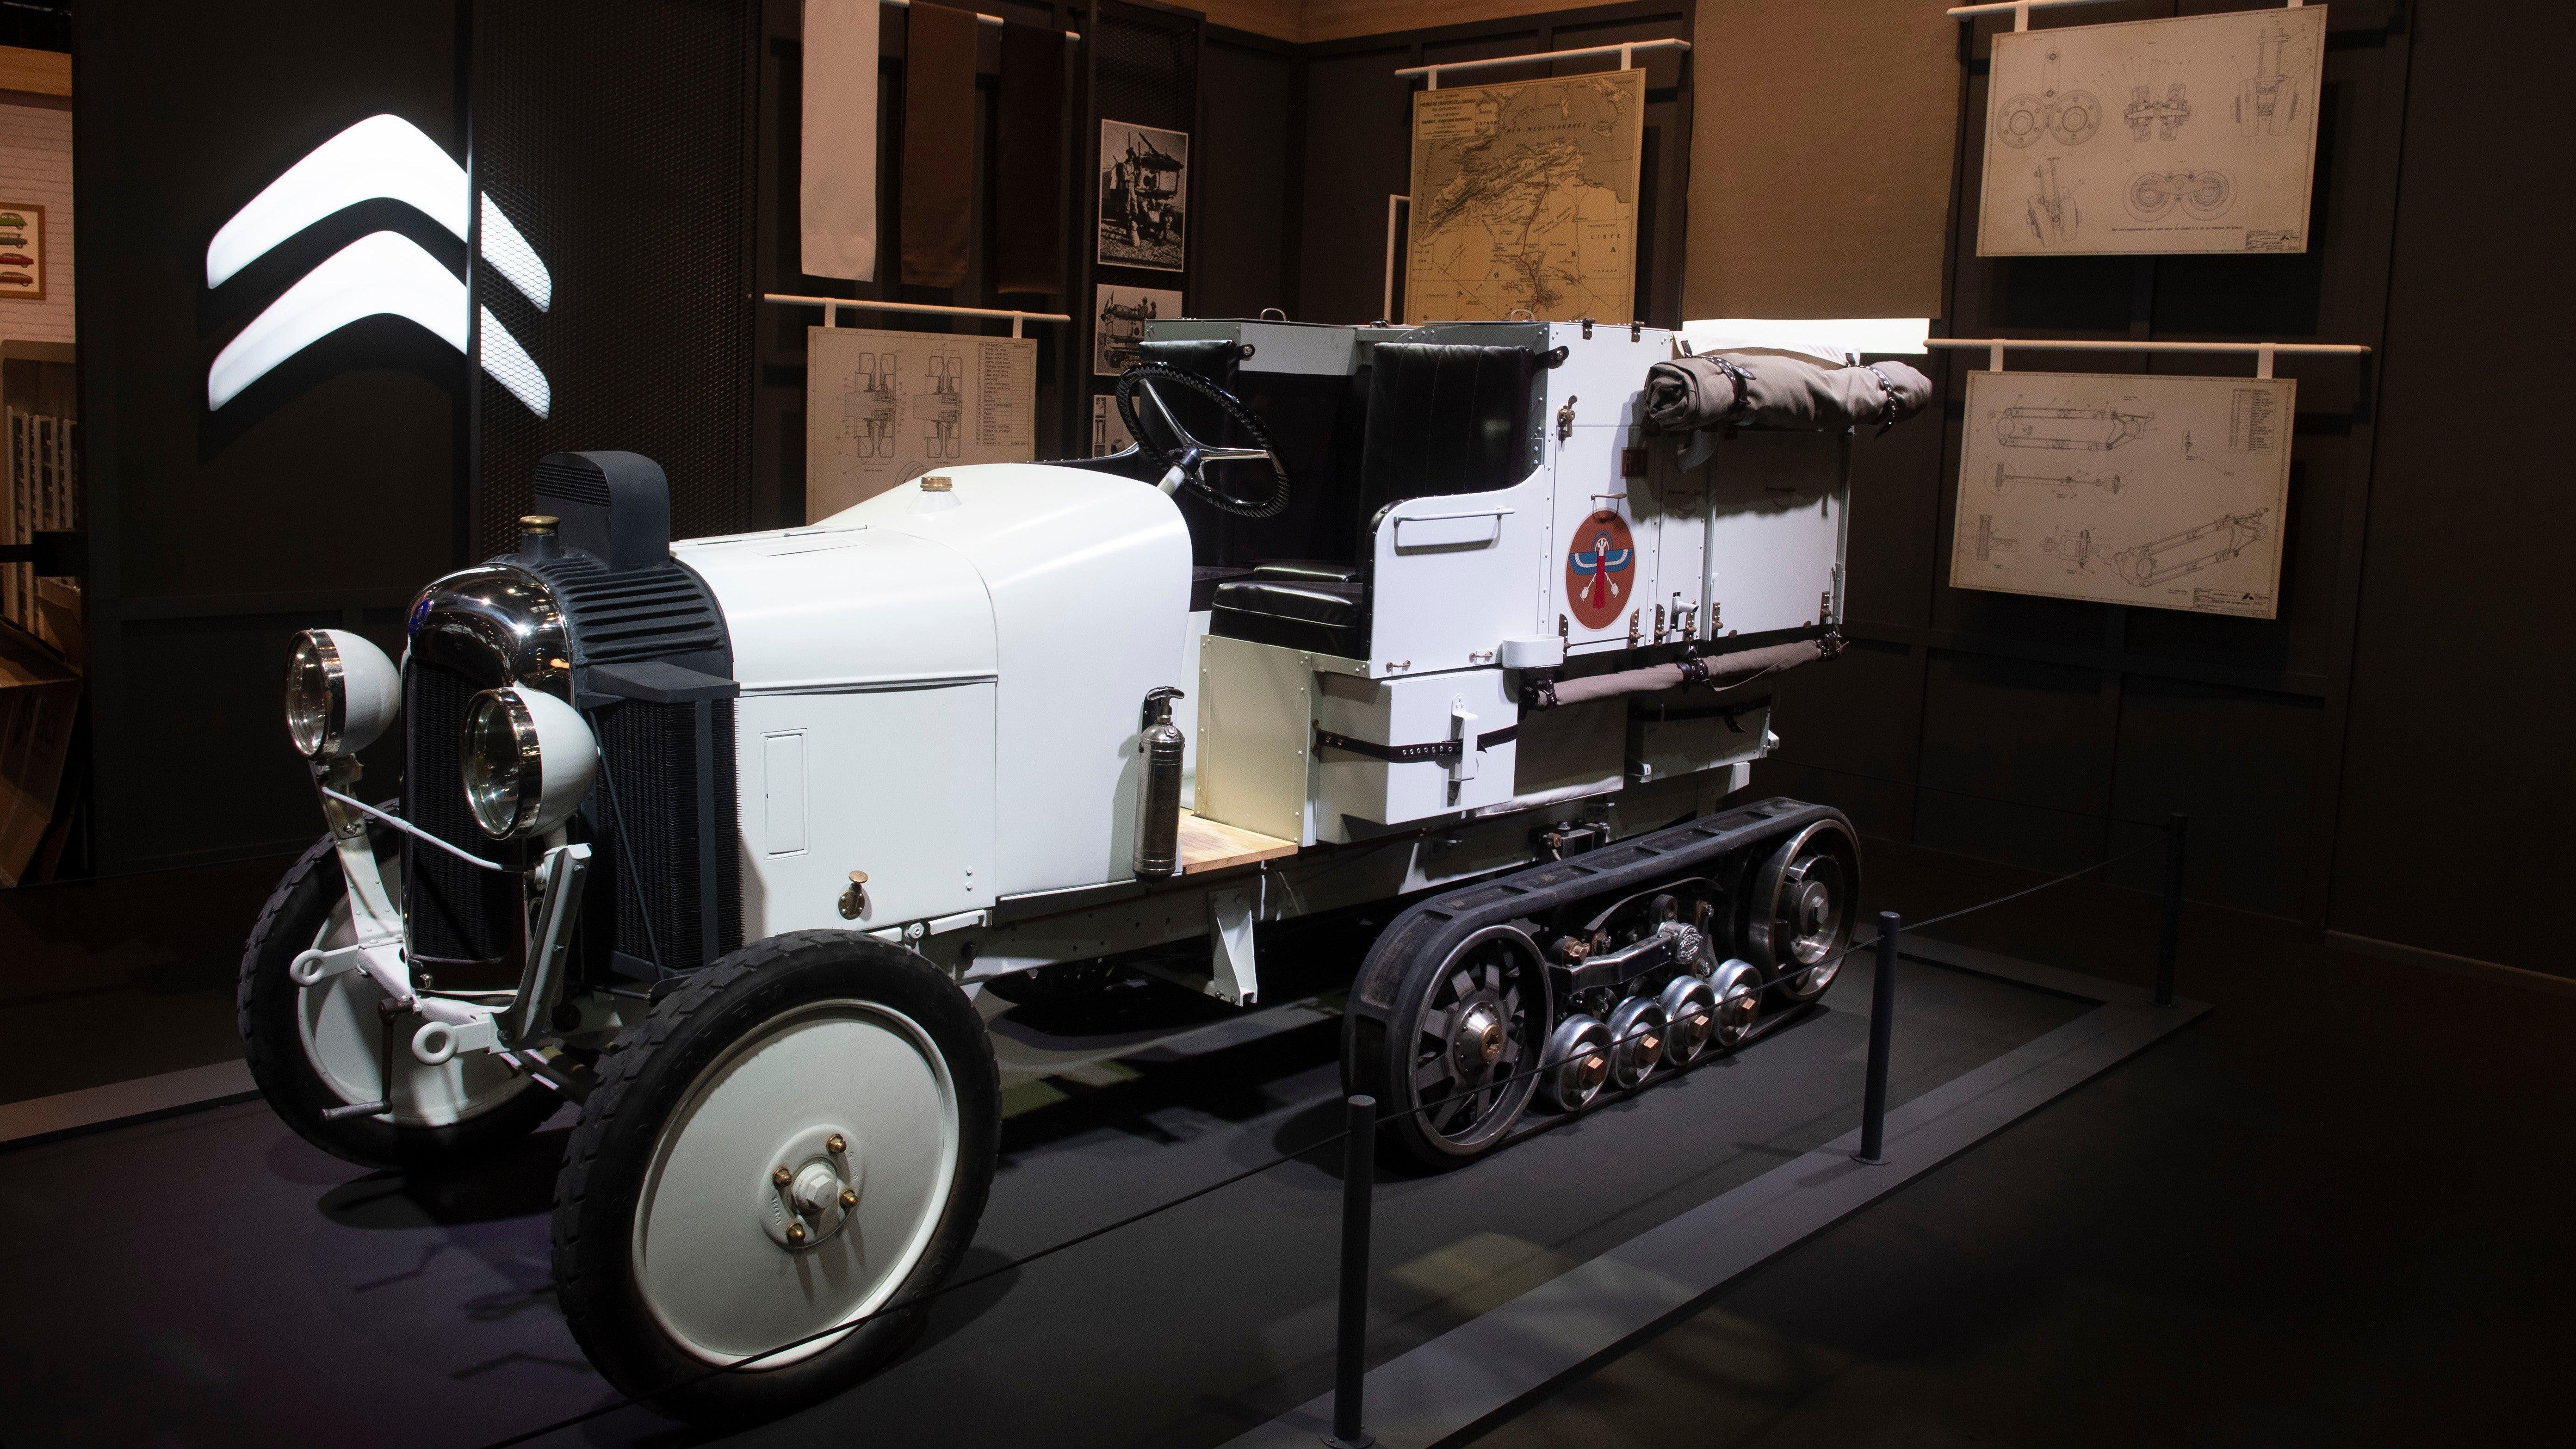 Citroën Recreated One Of Its Legendary Sahara-Crossing Half-Tracks From 1922